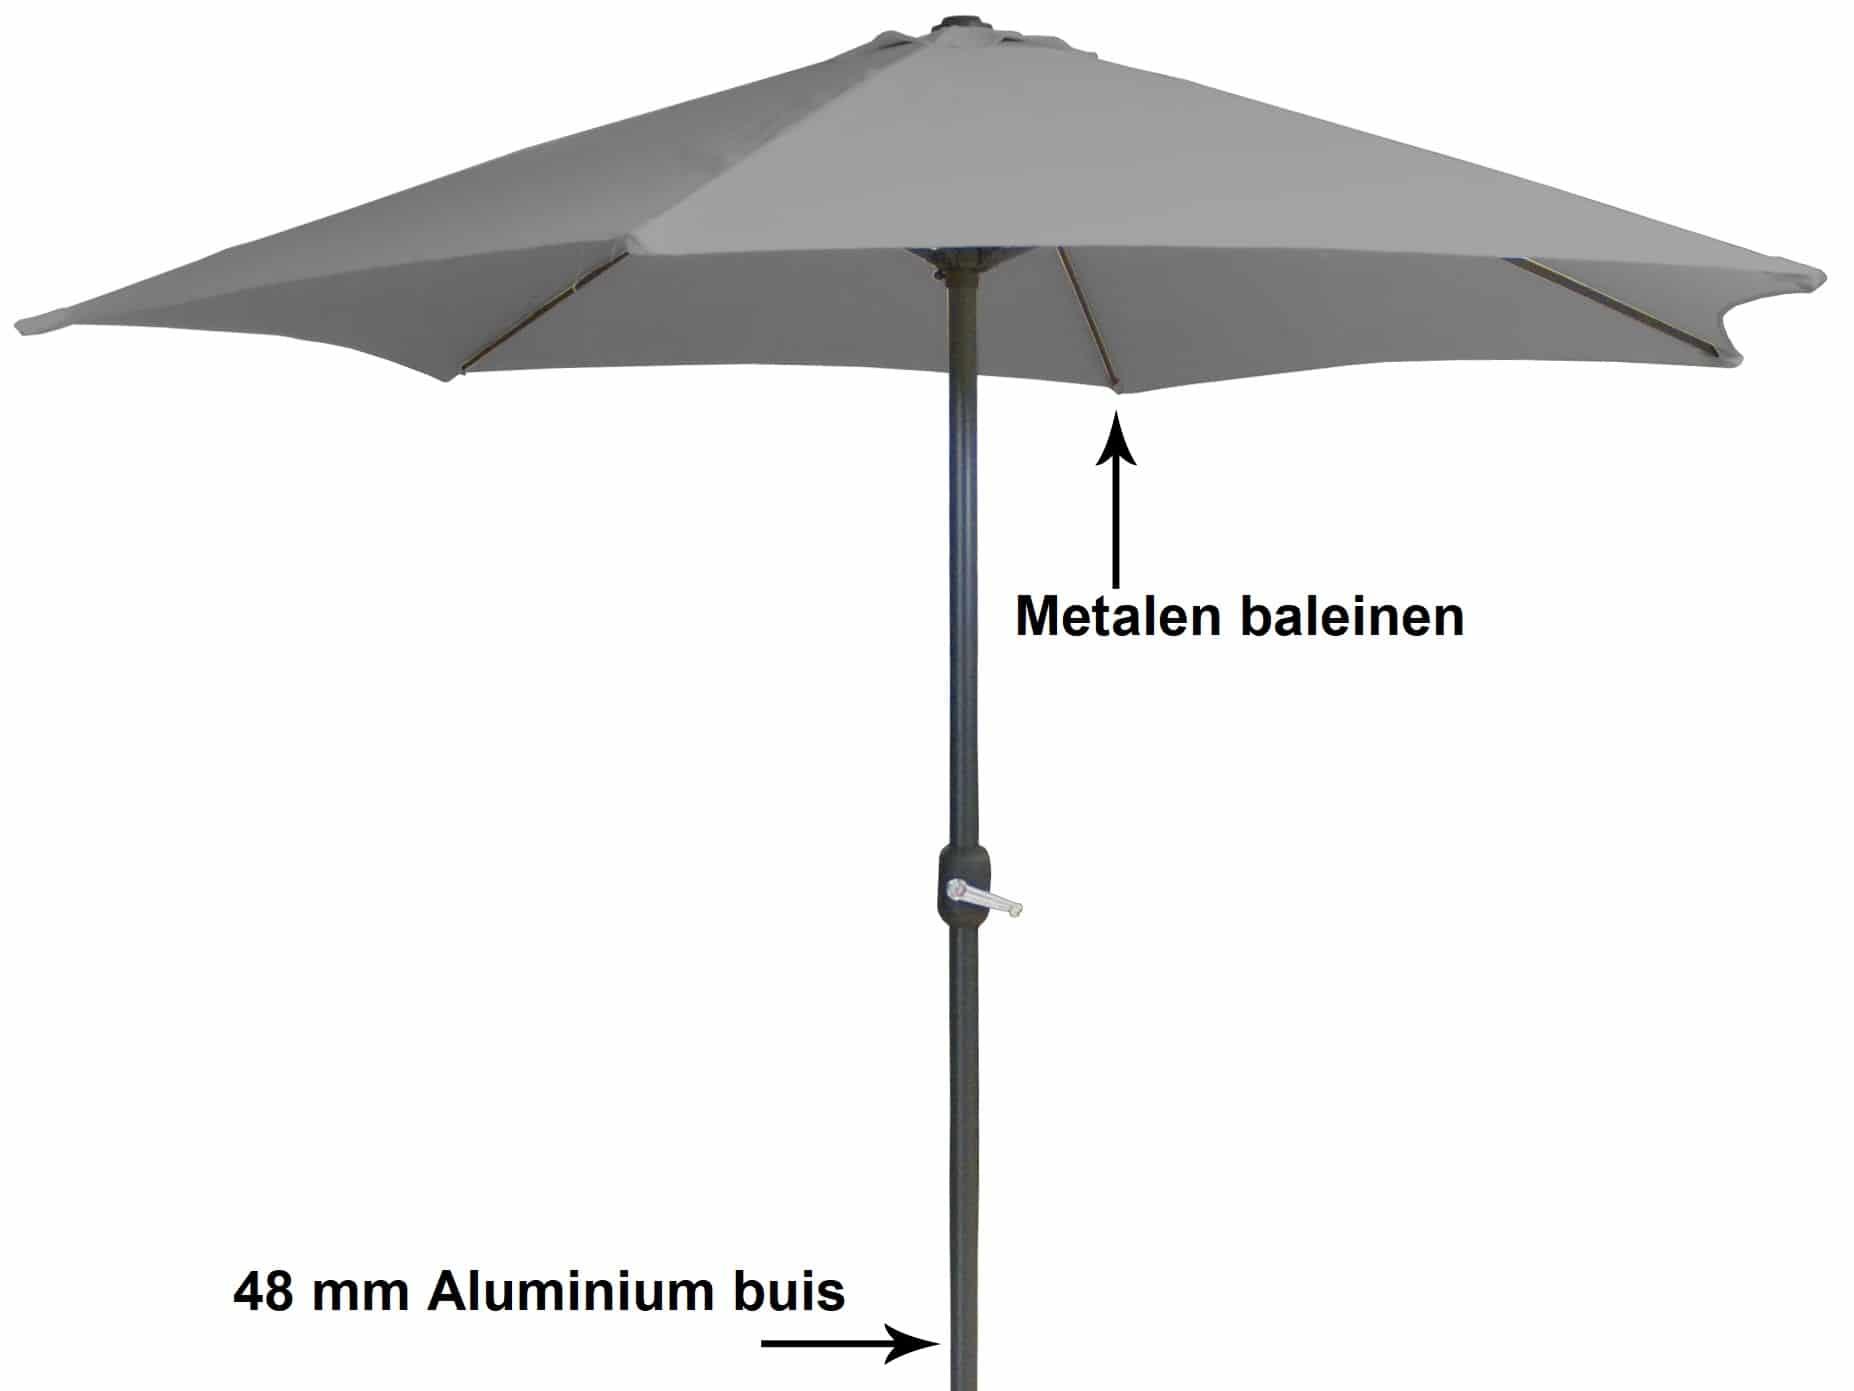 4Goodz Aluminium parasol 300 cm met opdraaimechanisme - Grijs